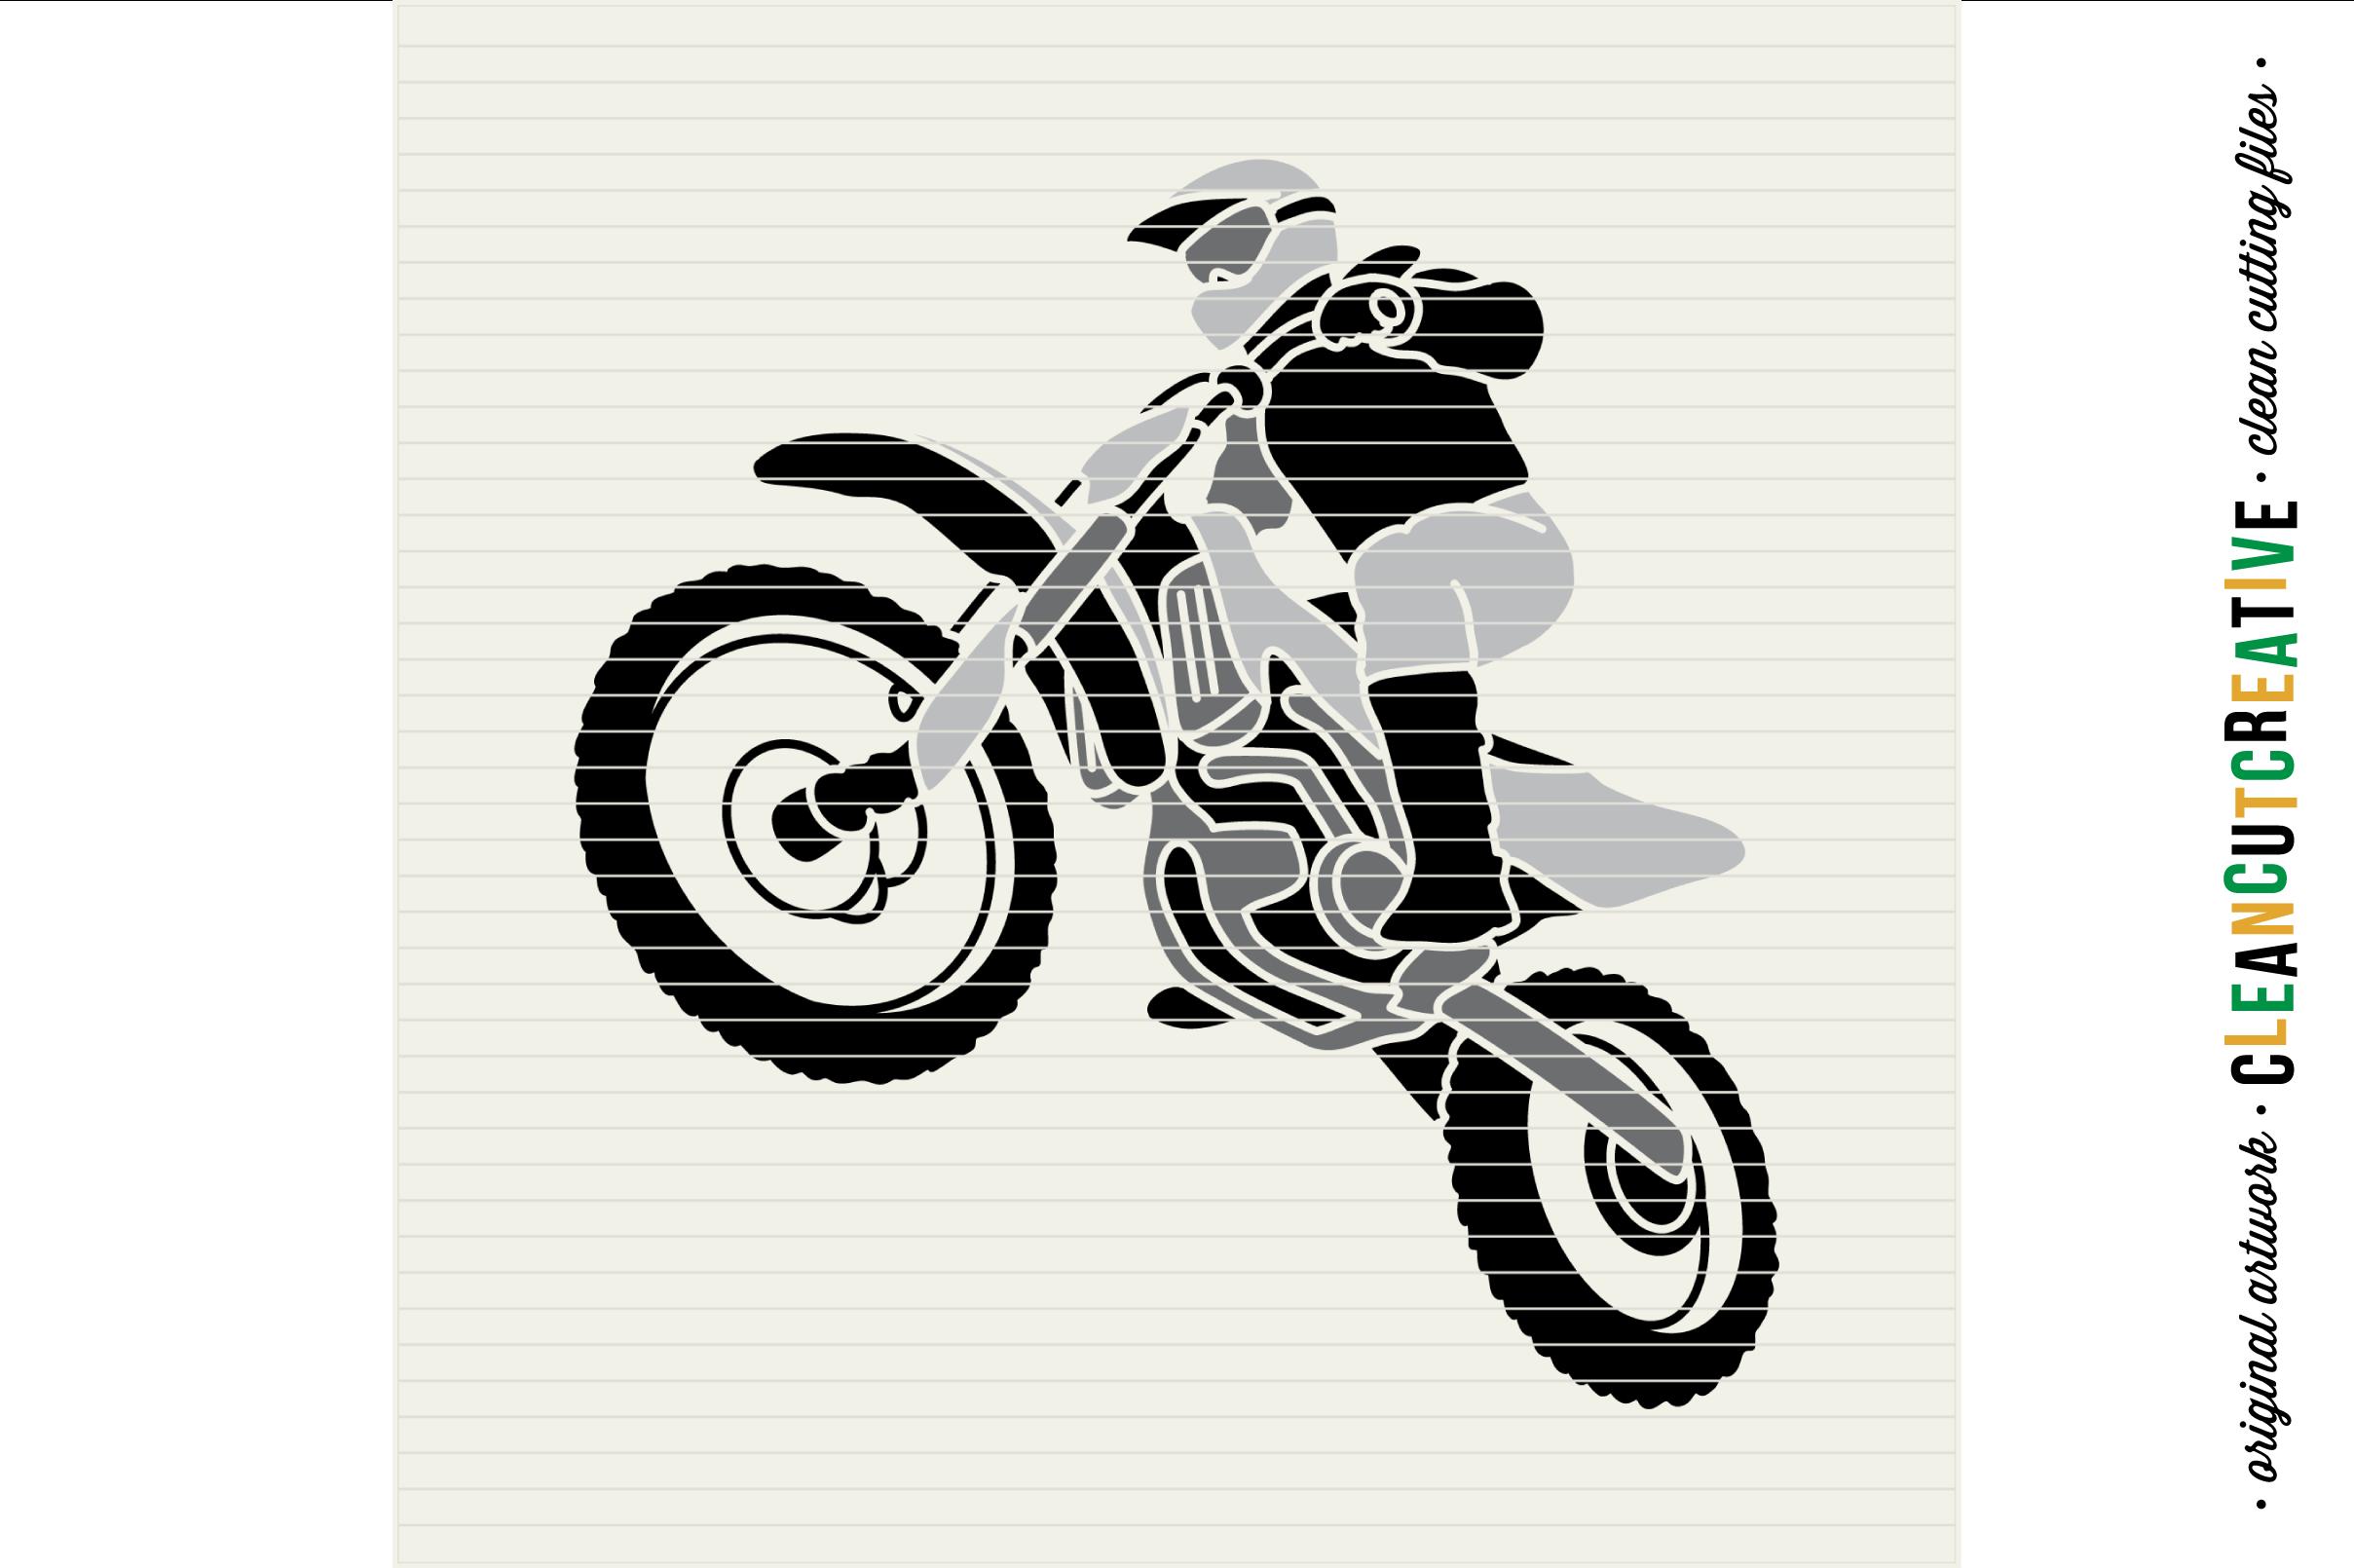 Motocross Dirt Bike design- SVG DXF EPSPNG - Cricut & Silhouette example image 3